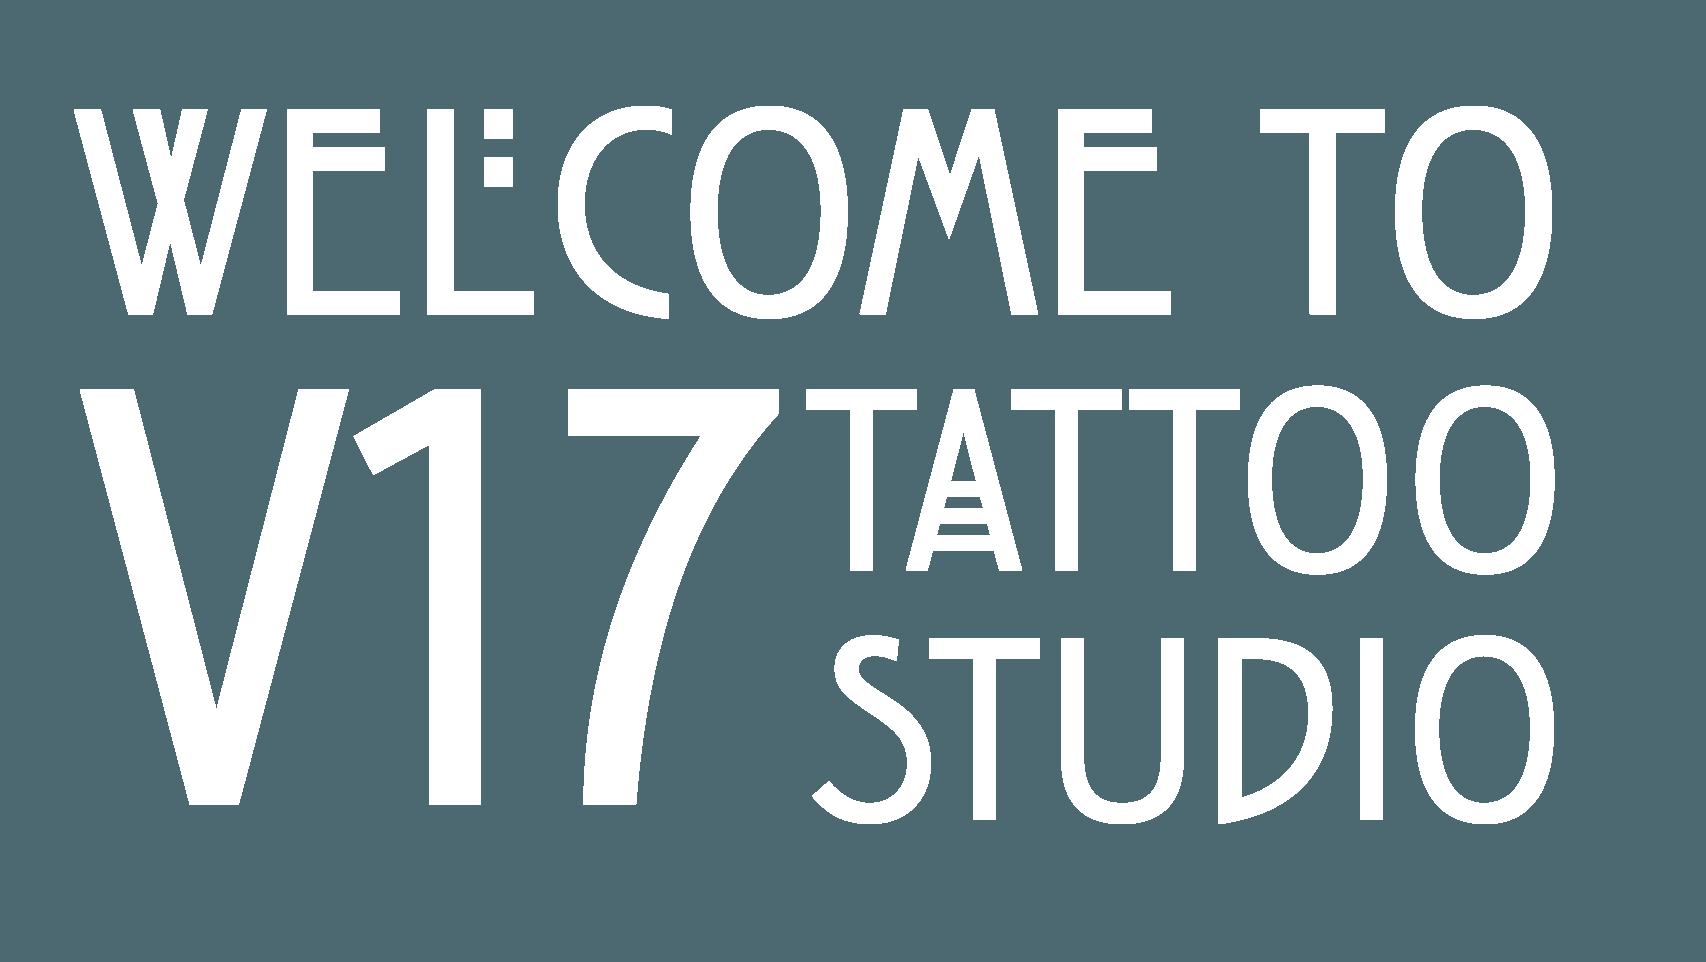 WELCOME TO V17 TATTOO STUDIO